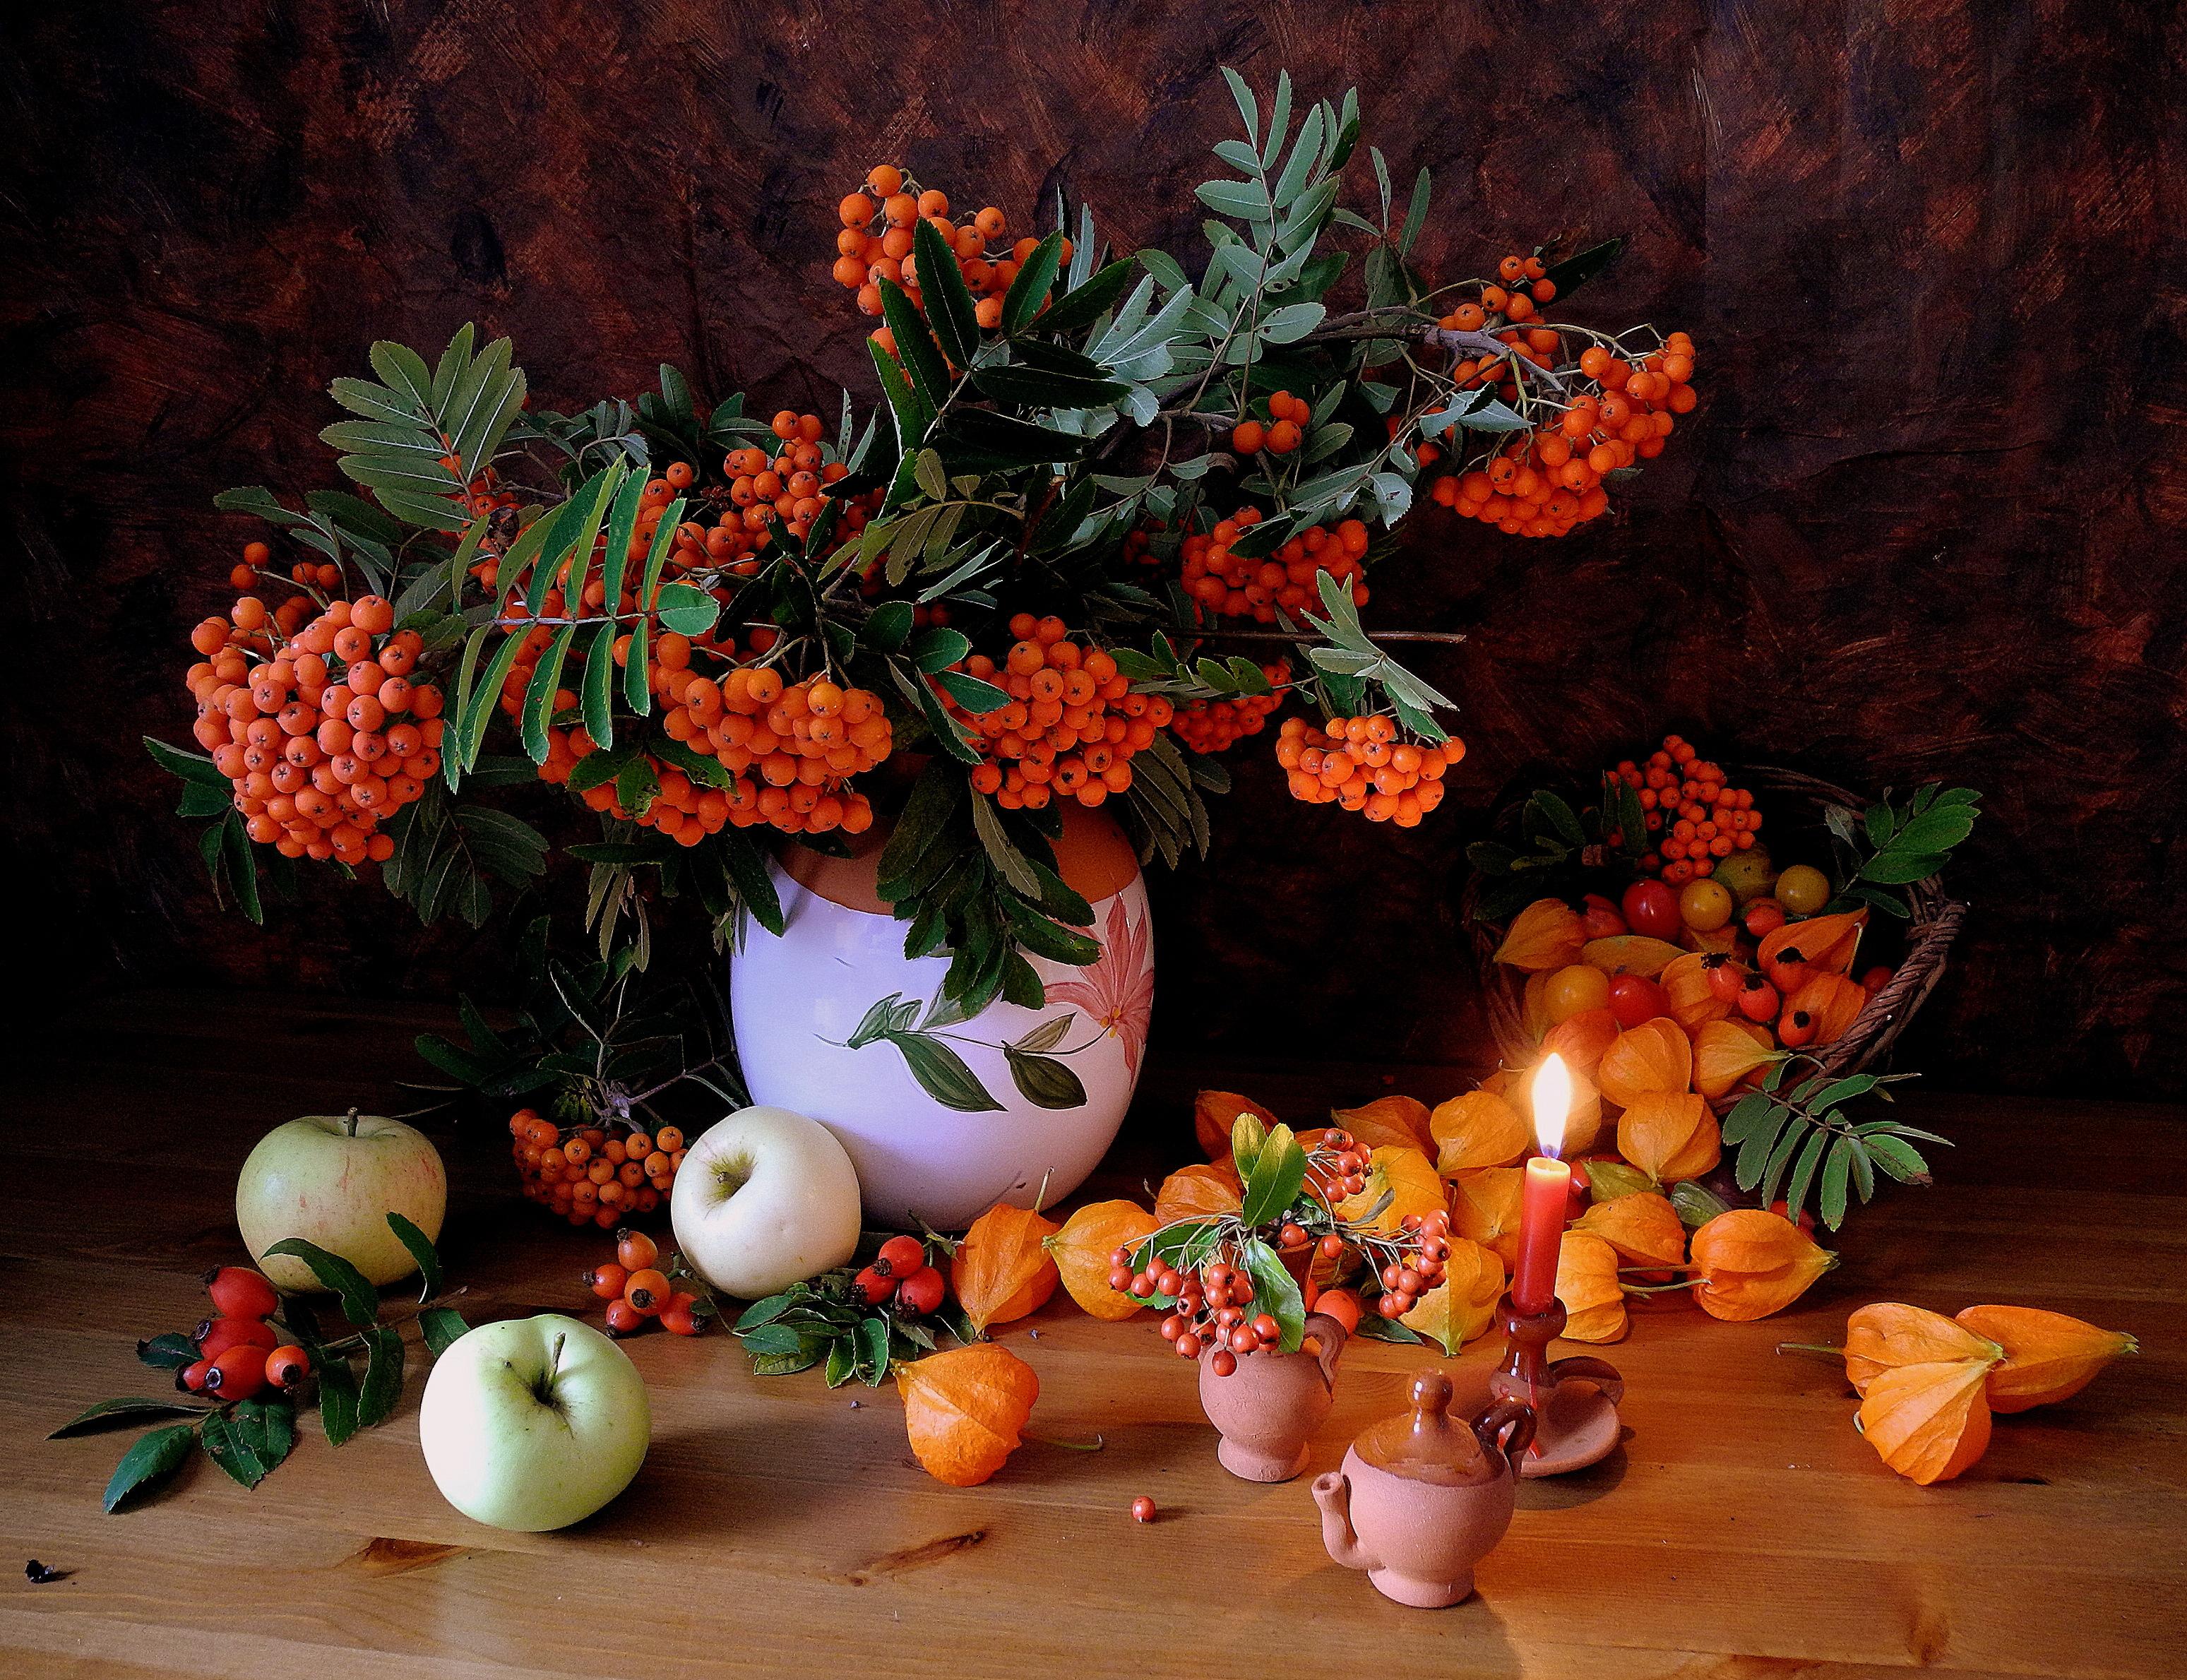 Apple Apricot Berry Candle Fruit Leaf Pitcher Still Life Vase Orange Color 3097x2379